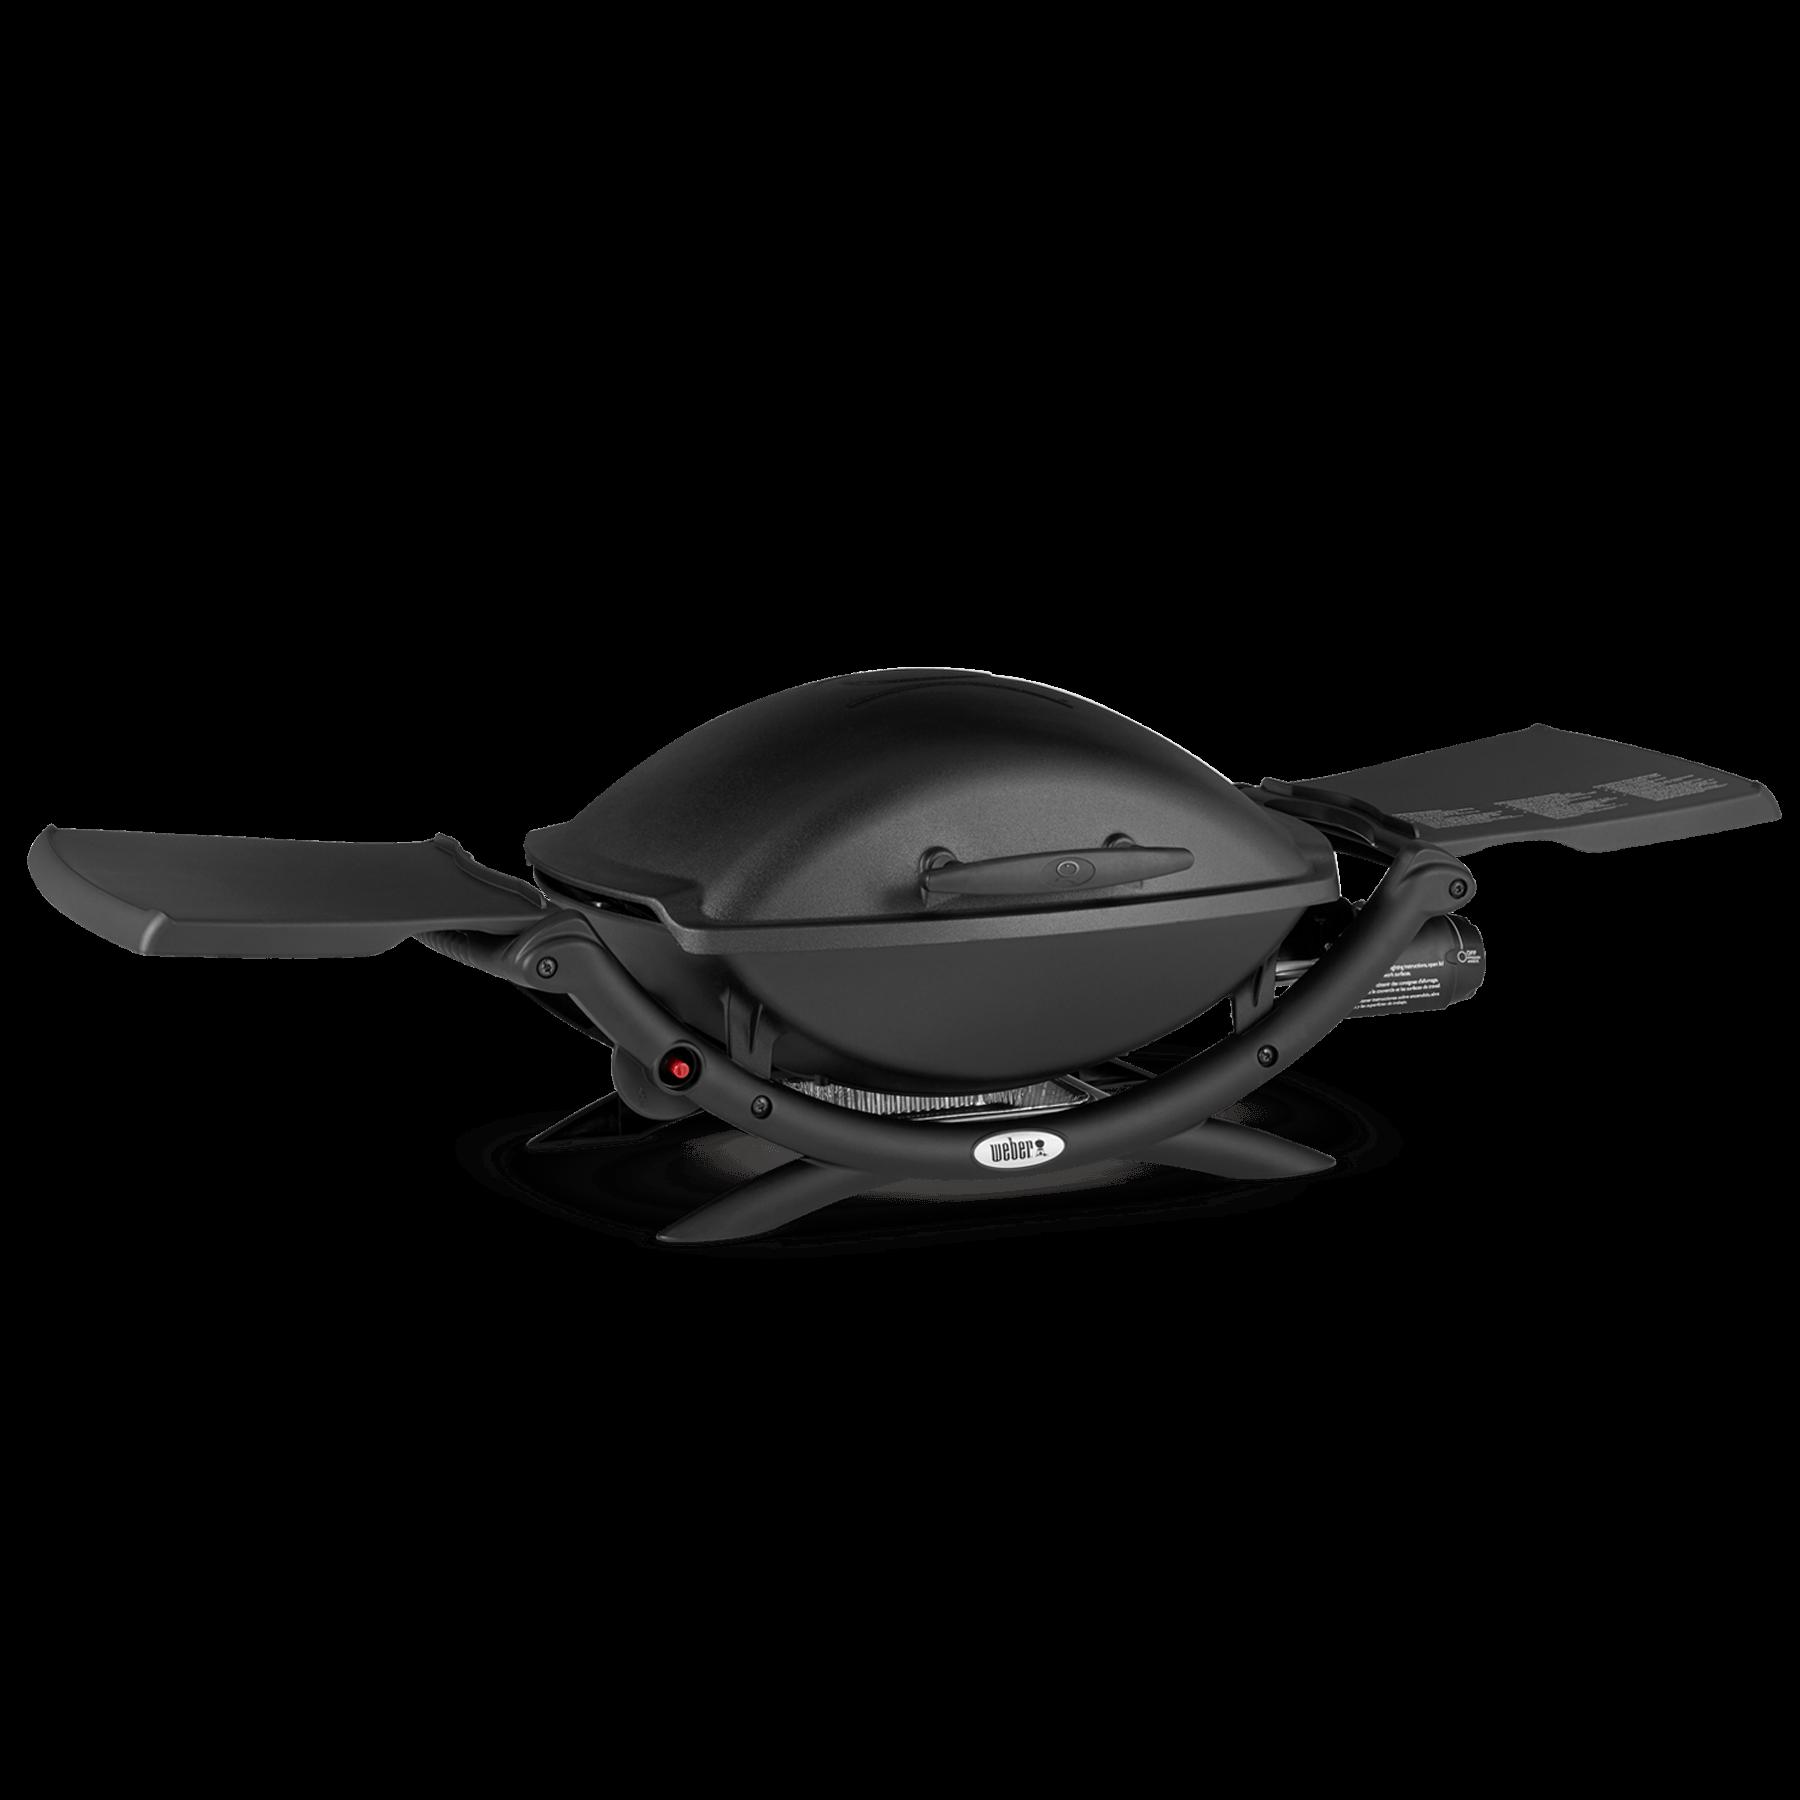 weber q 2200 gasgrill weber grill original. Black Bedroom Furniture Sets. Home Design Ideas